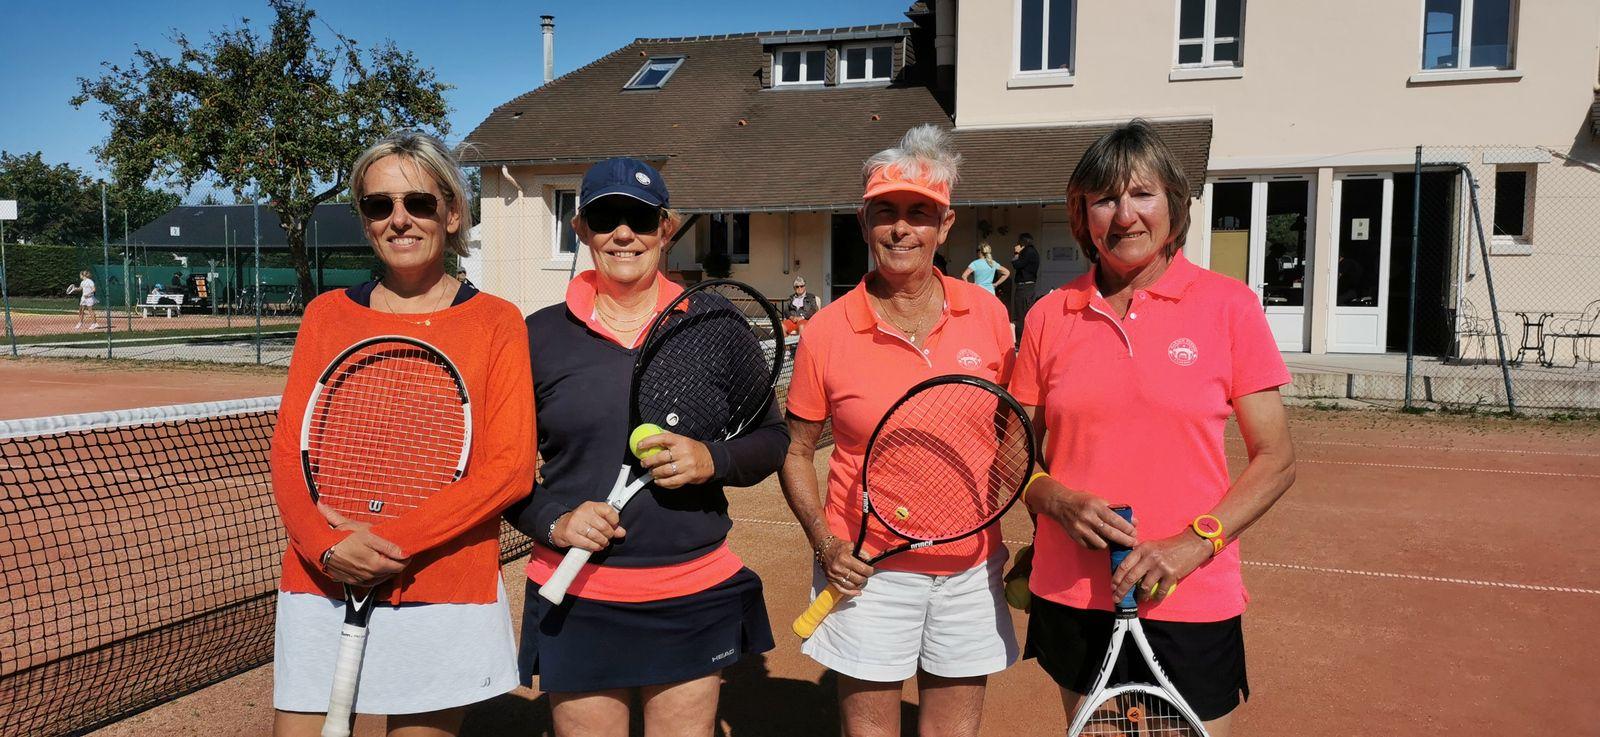 Double Nathalie Billouin/Véronique Hamerel Cabourg perd contre Catherine Rolland/Christiane Collet Cabourg